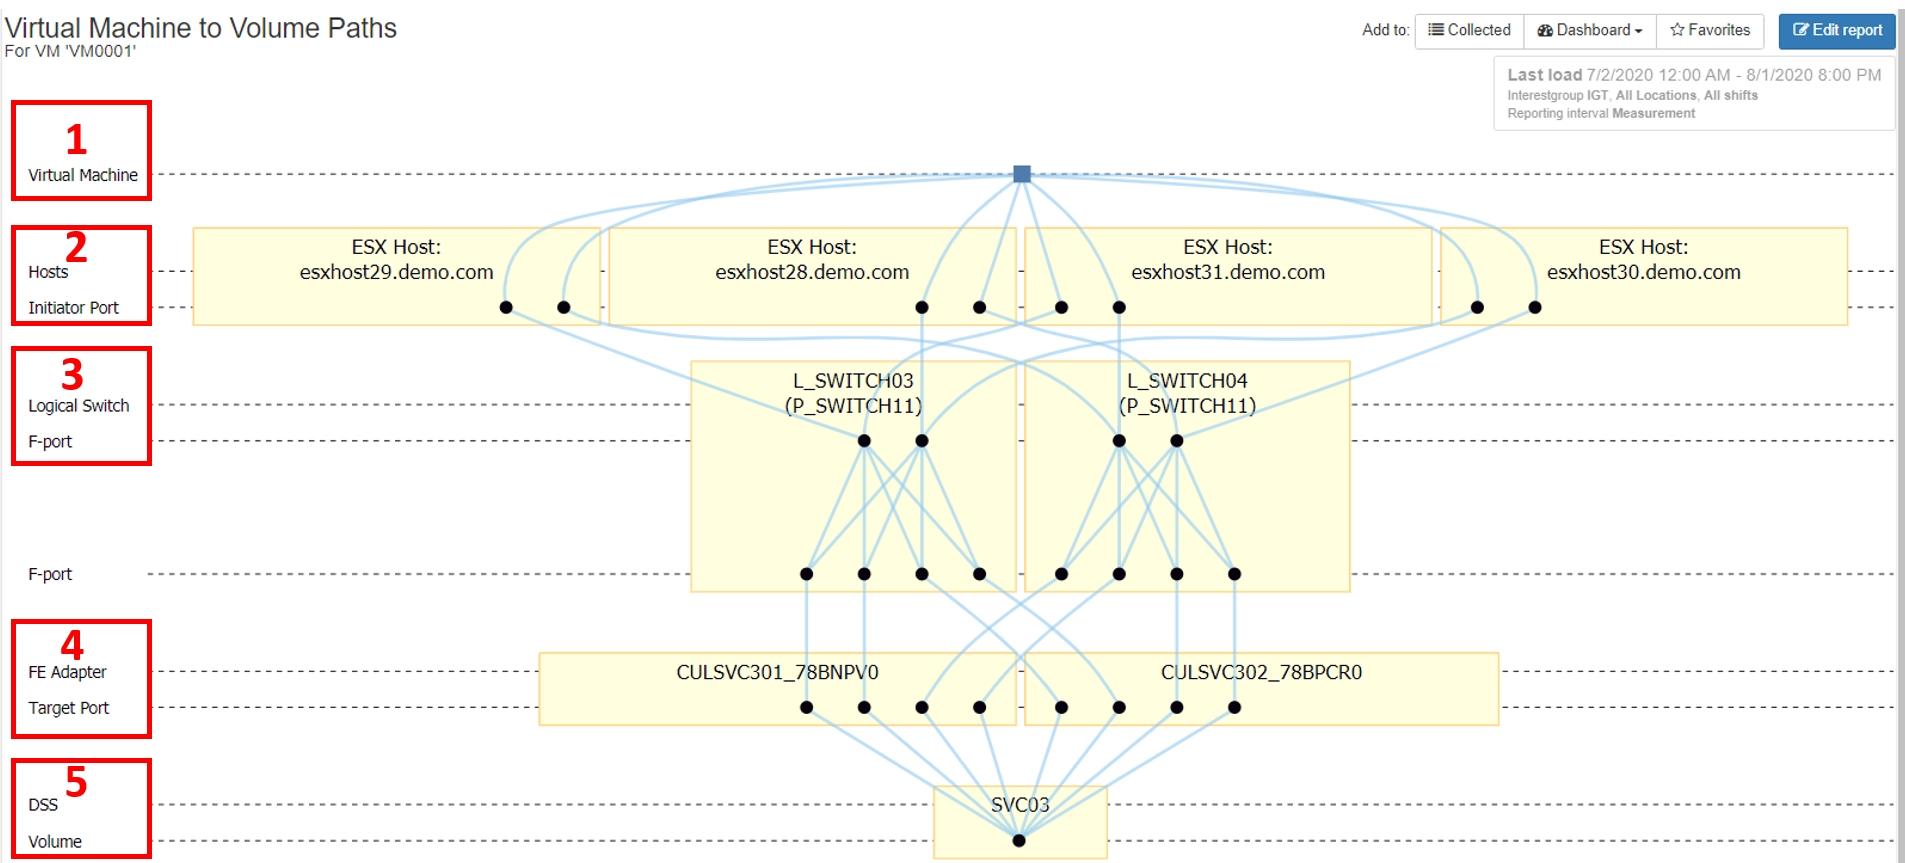 IntelliMagic Vision Topology Chart